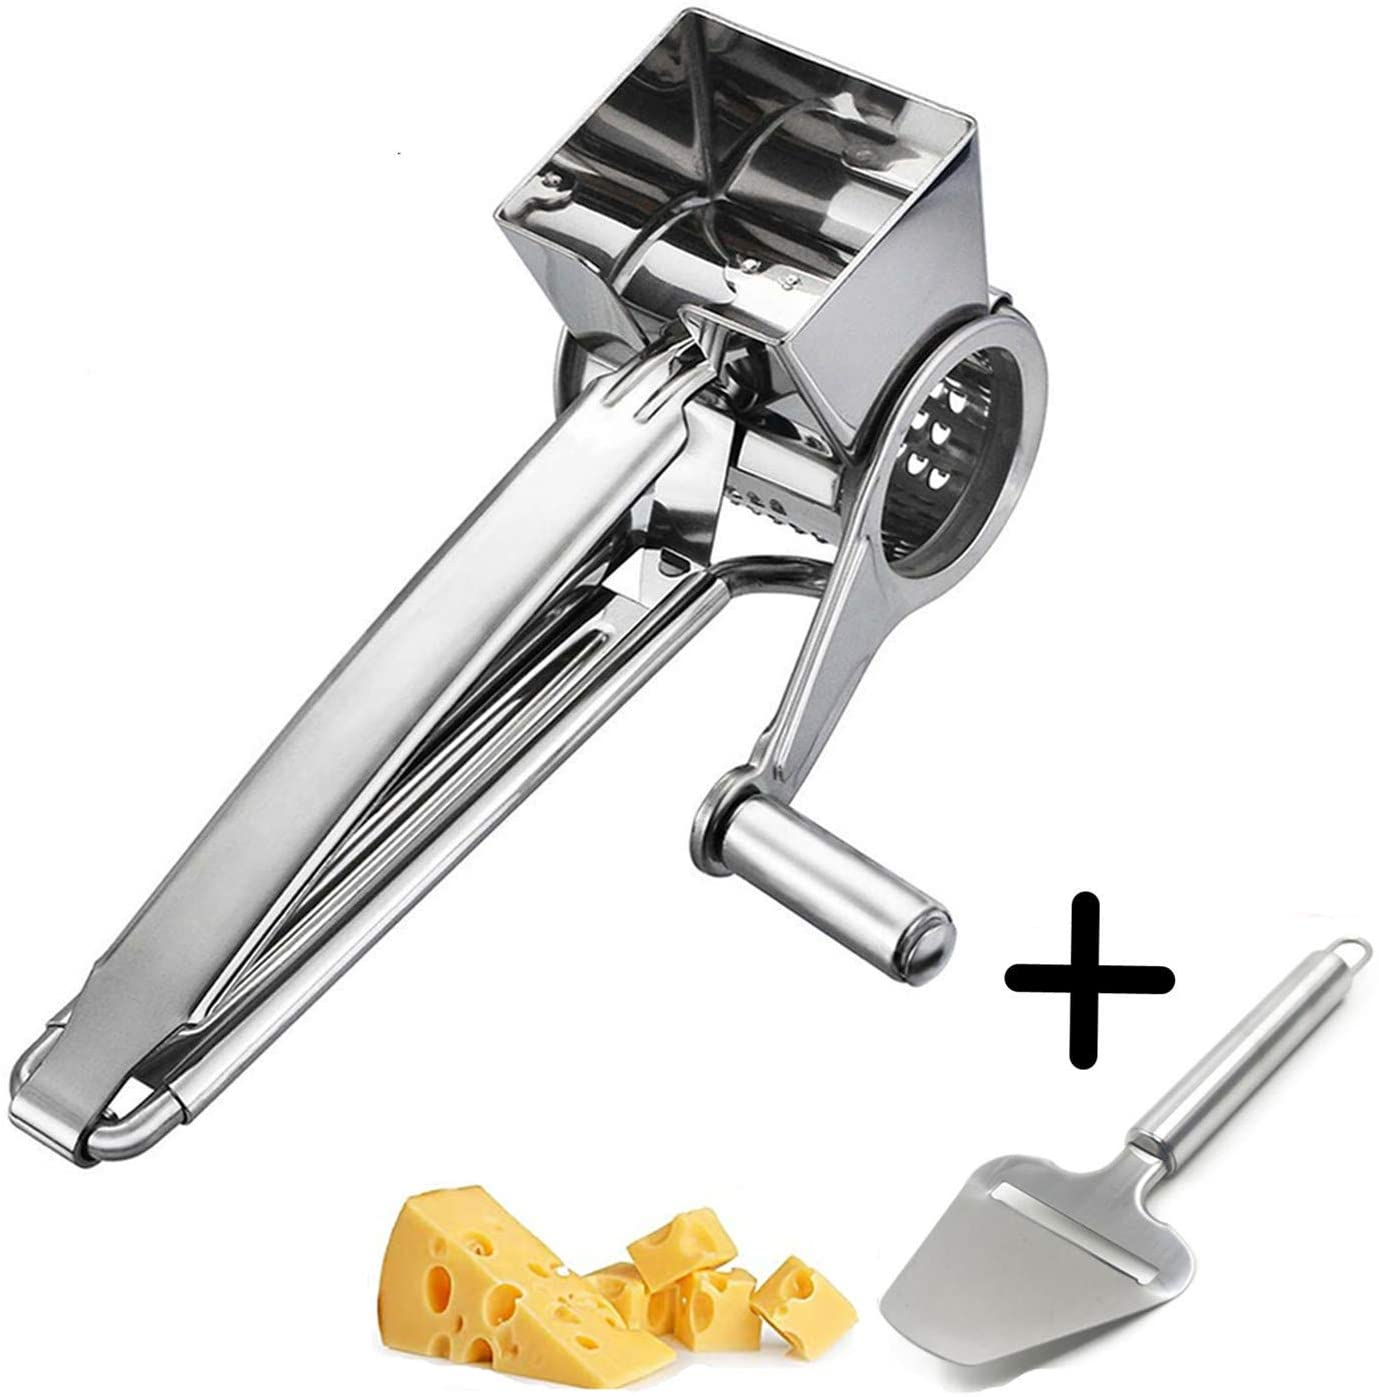 Cheese Grater Cuter Parmesan Cheese Lemon, Ginger, Garlic, Nutmeg, Chocolate, Vegetables, Fruits - Razor-Sharp Stainless Steel Blade Wide Dishwasher Safe